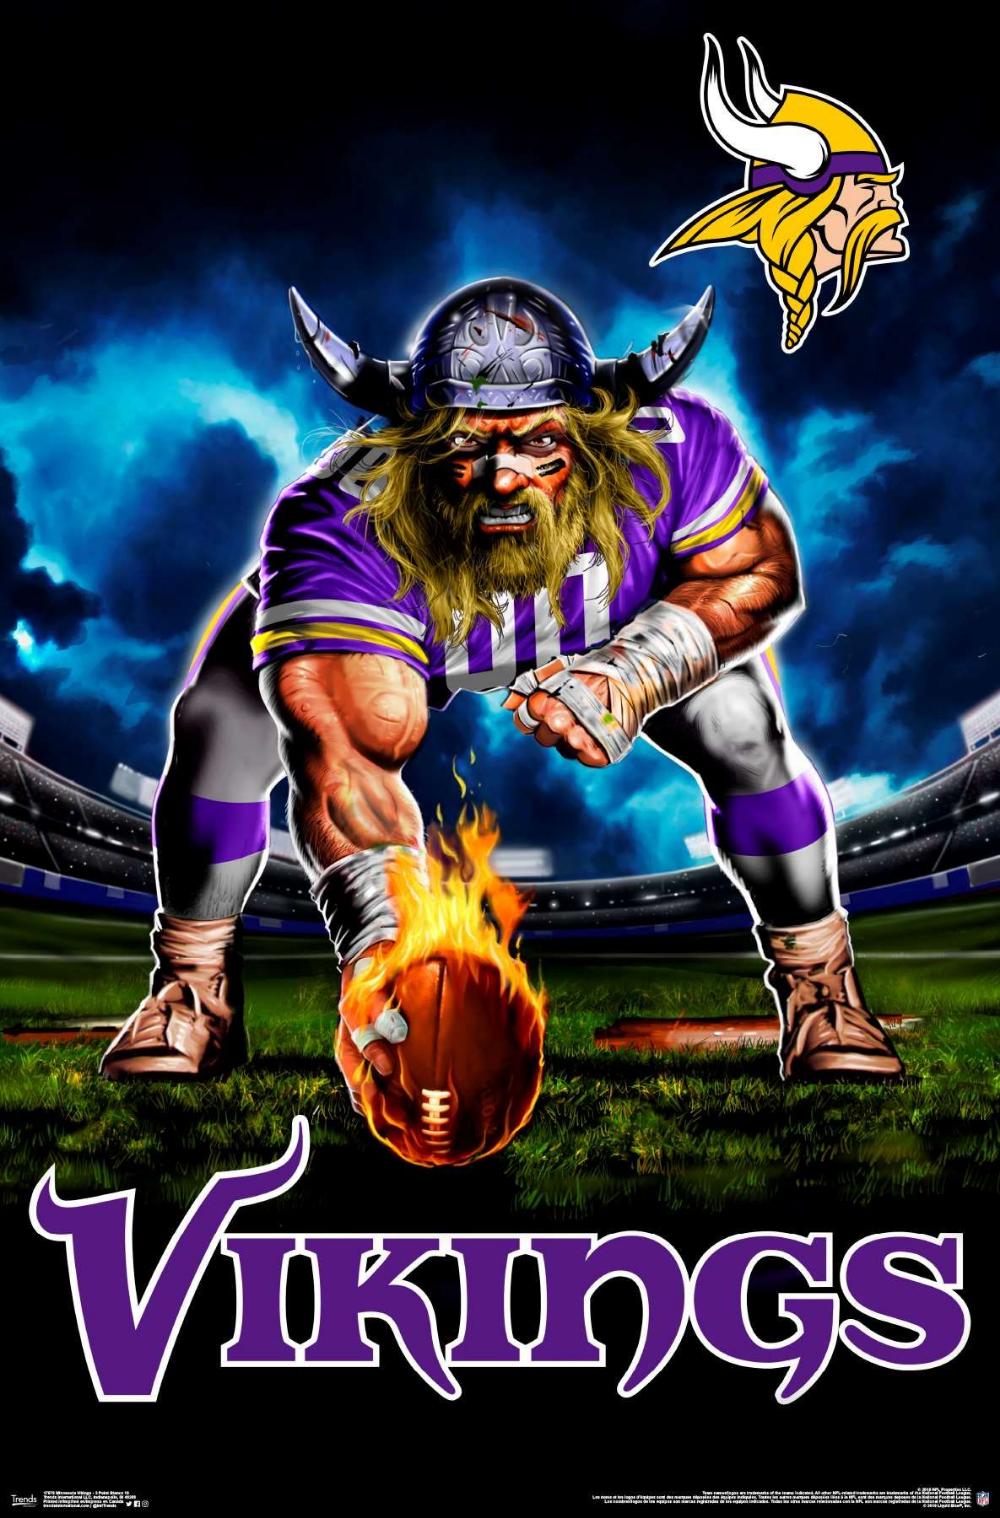 Nfl Minnesota Vikings 3 Point Stance In 2020